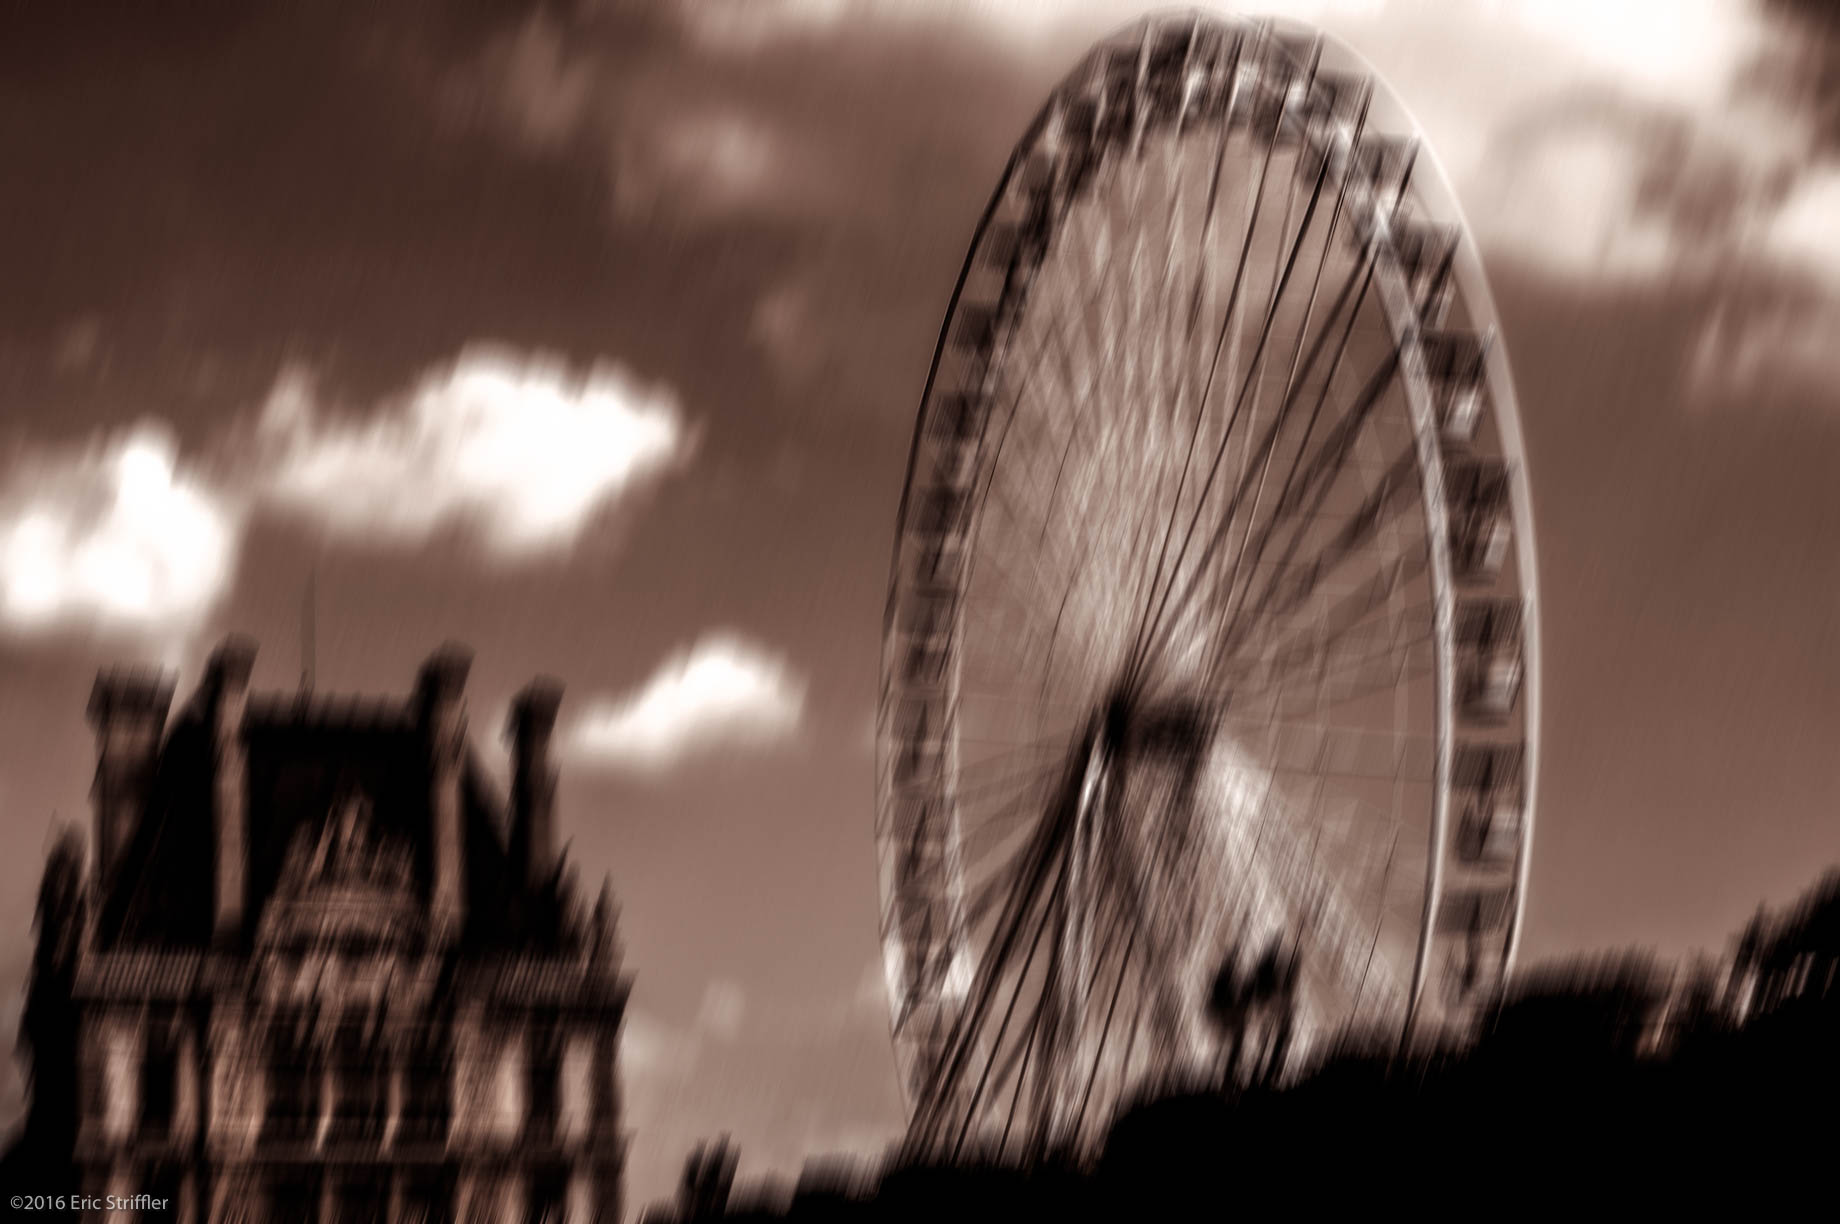 eric_striffler_photography_travel-68.jpg